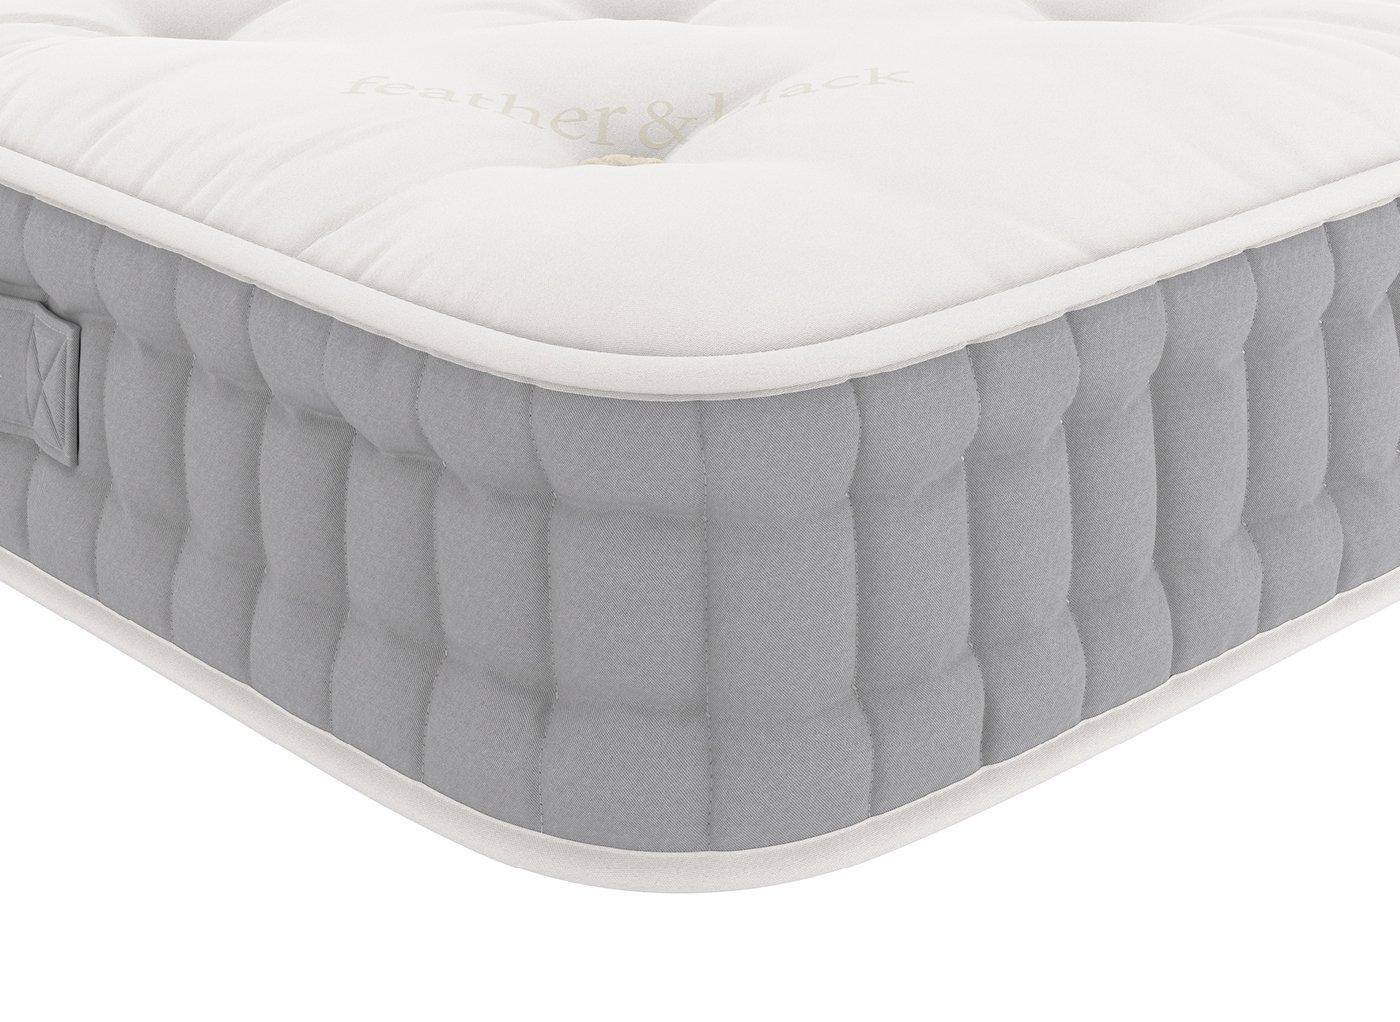 feather---black-holywell-pocket-spring-mattress